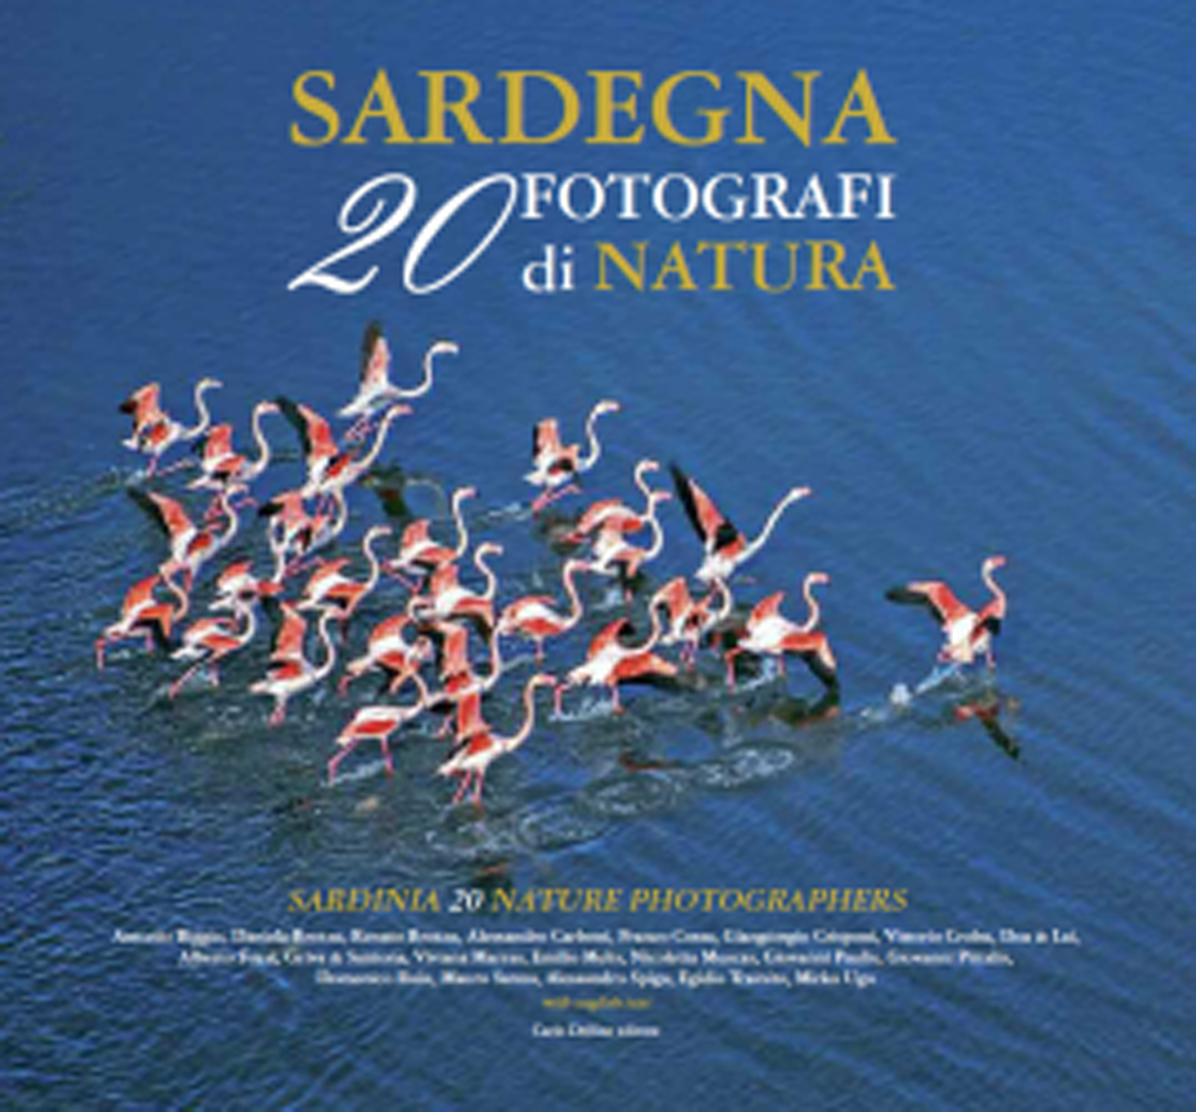 sardegna_20_fotografi_di_natura